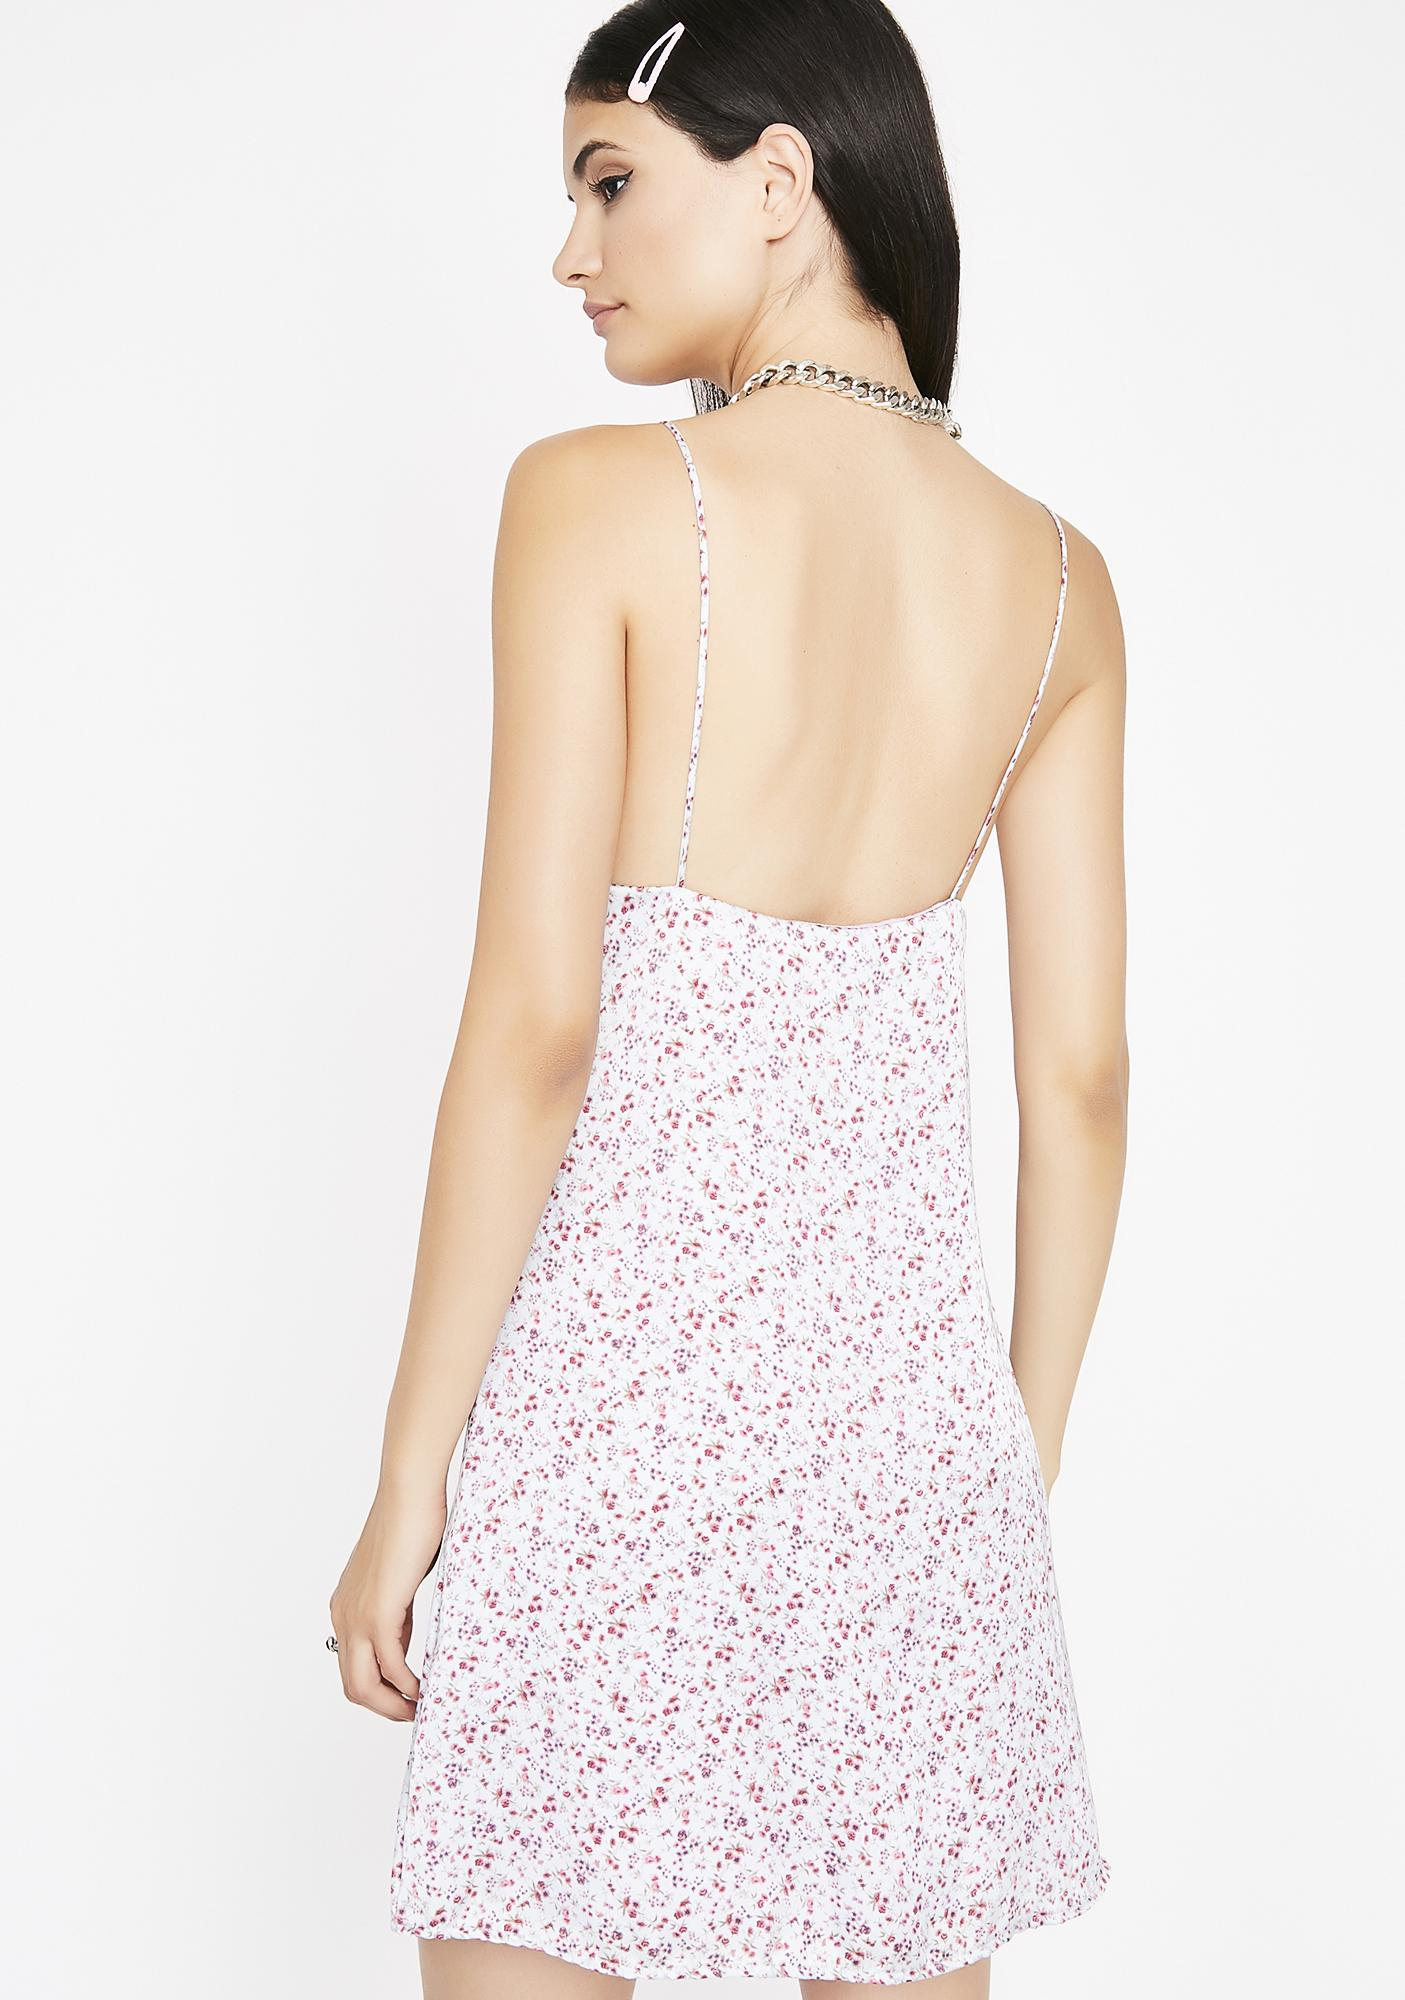 Ain't My Fault Floral Dress